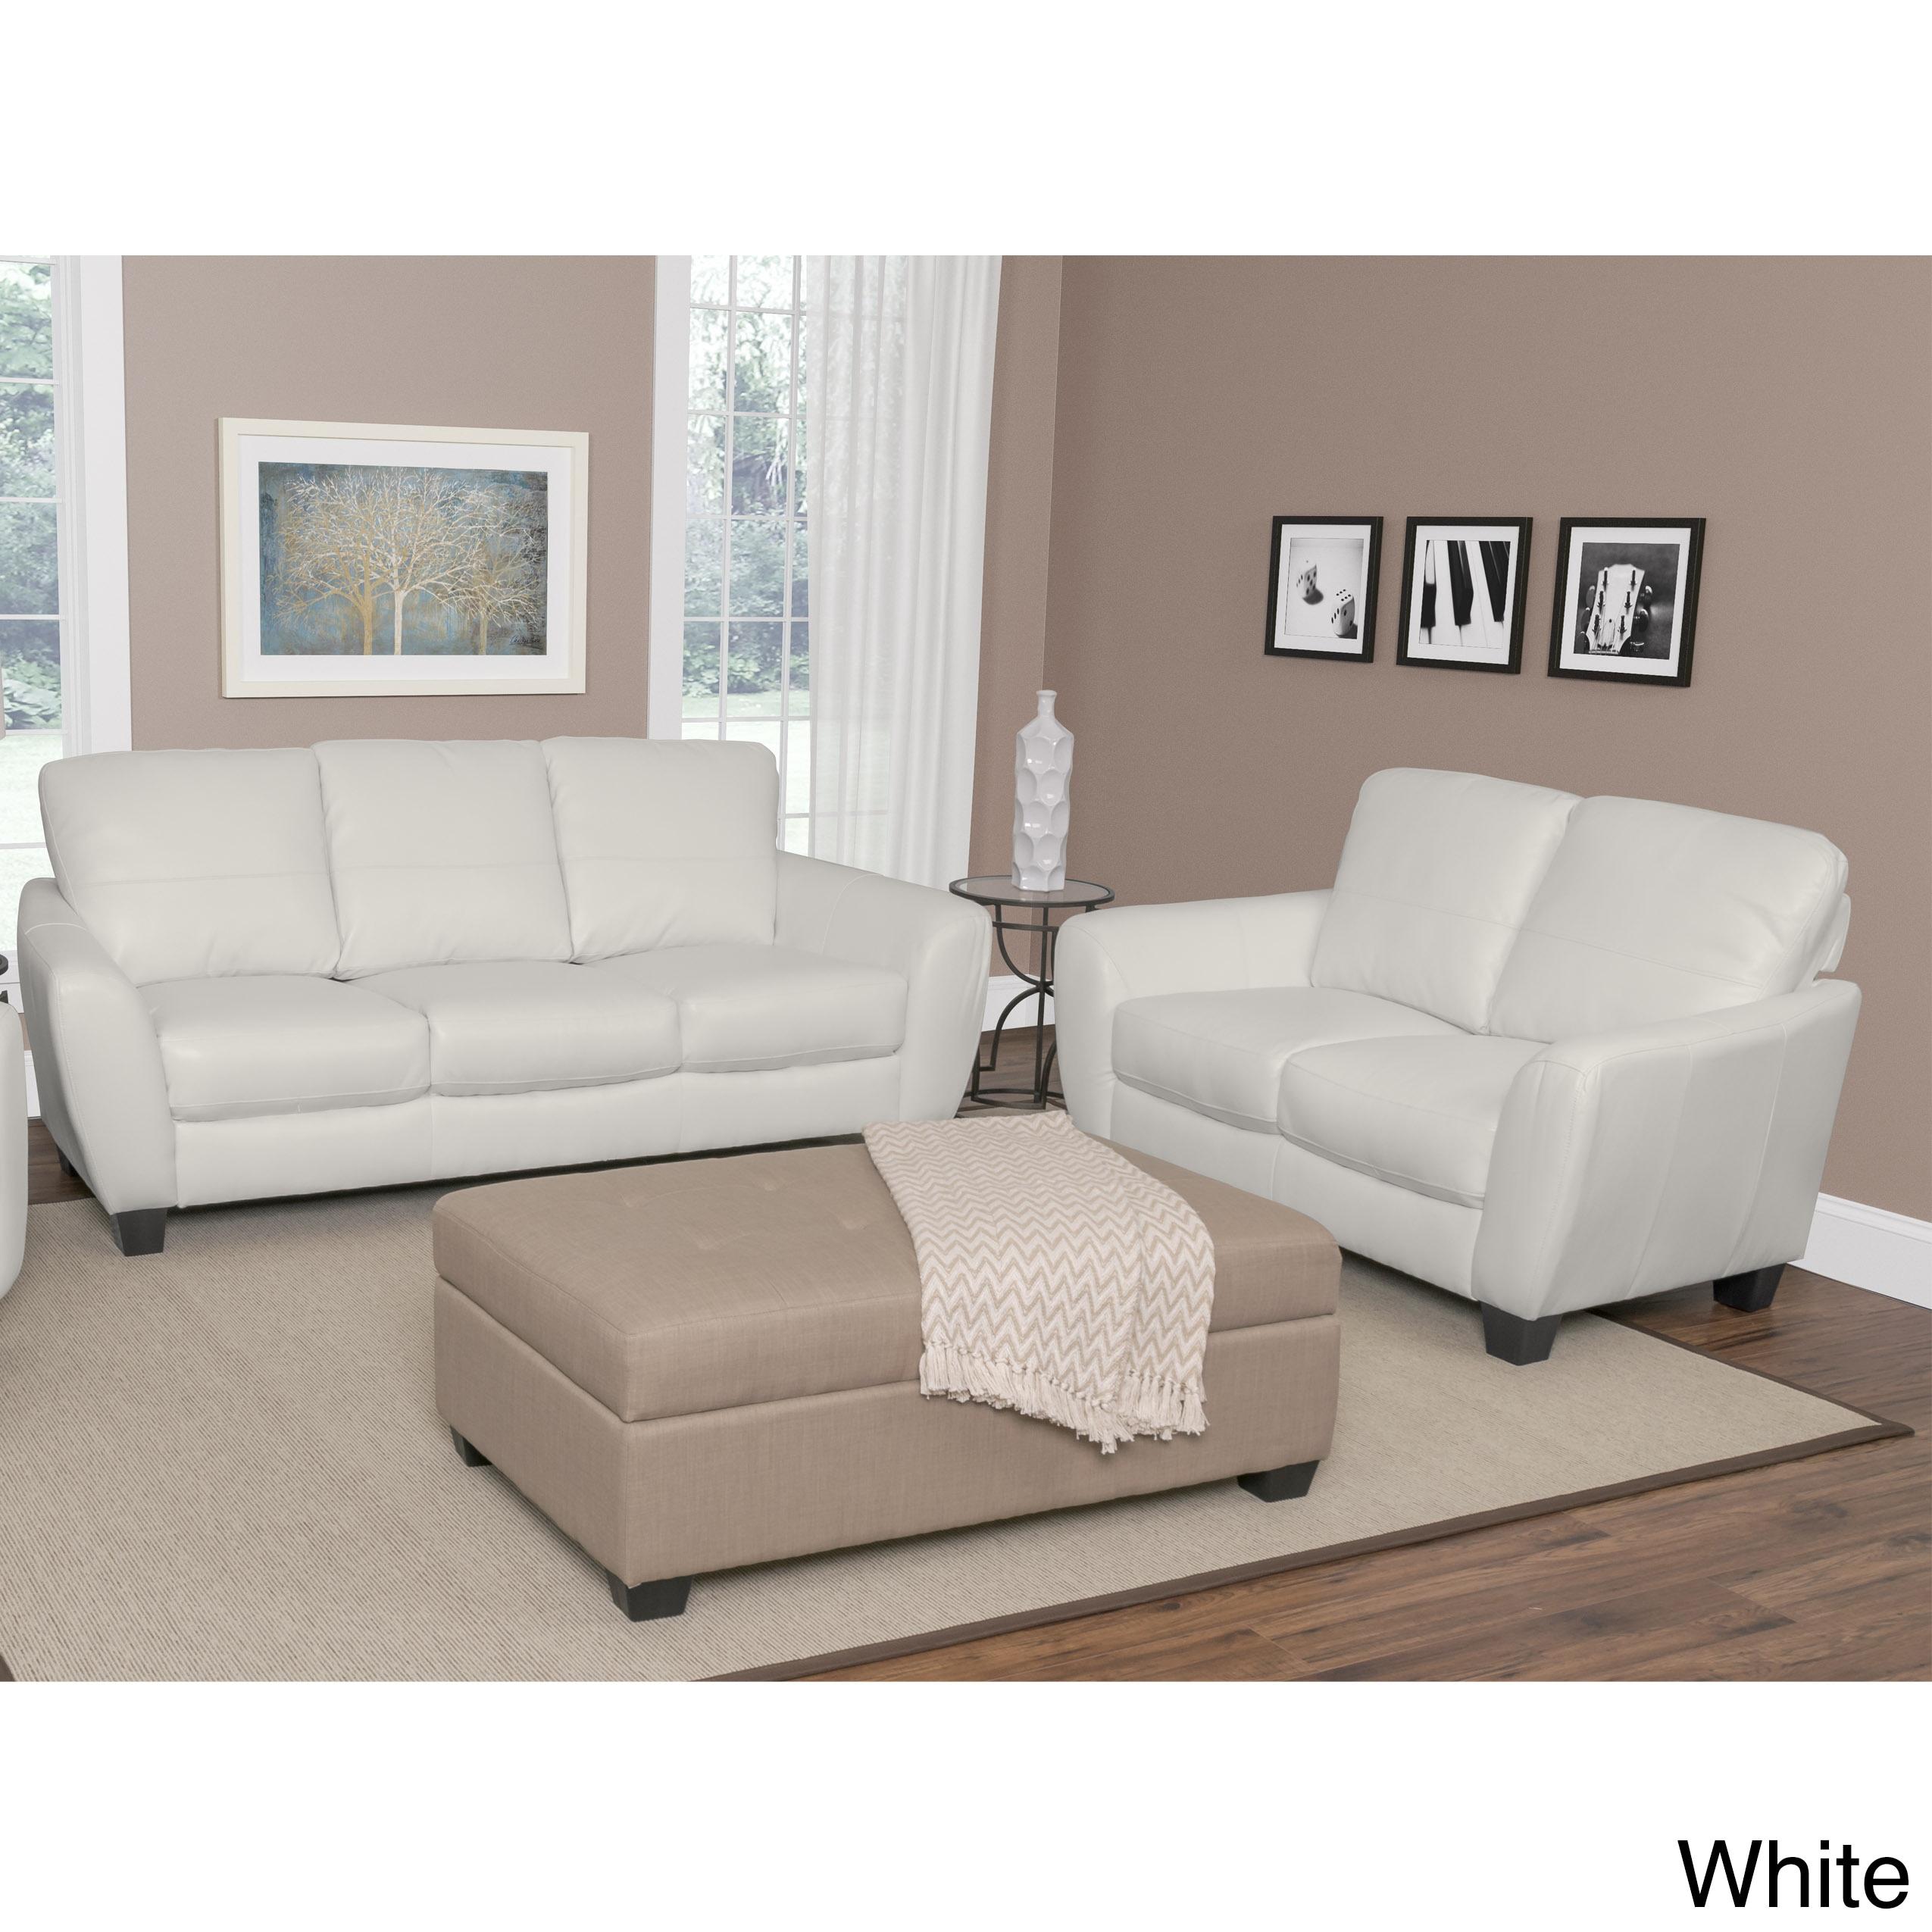 CorLiving Jazz 2-piece Bonded Leather Sofa Set (White)